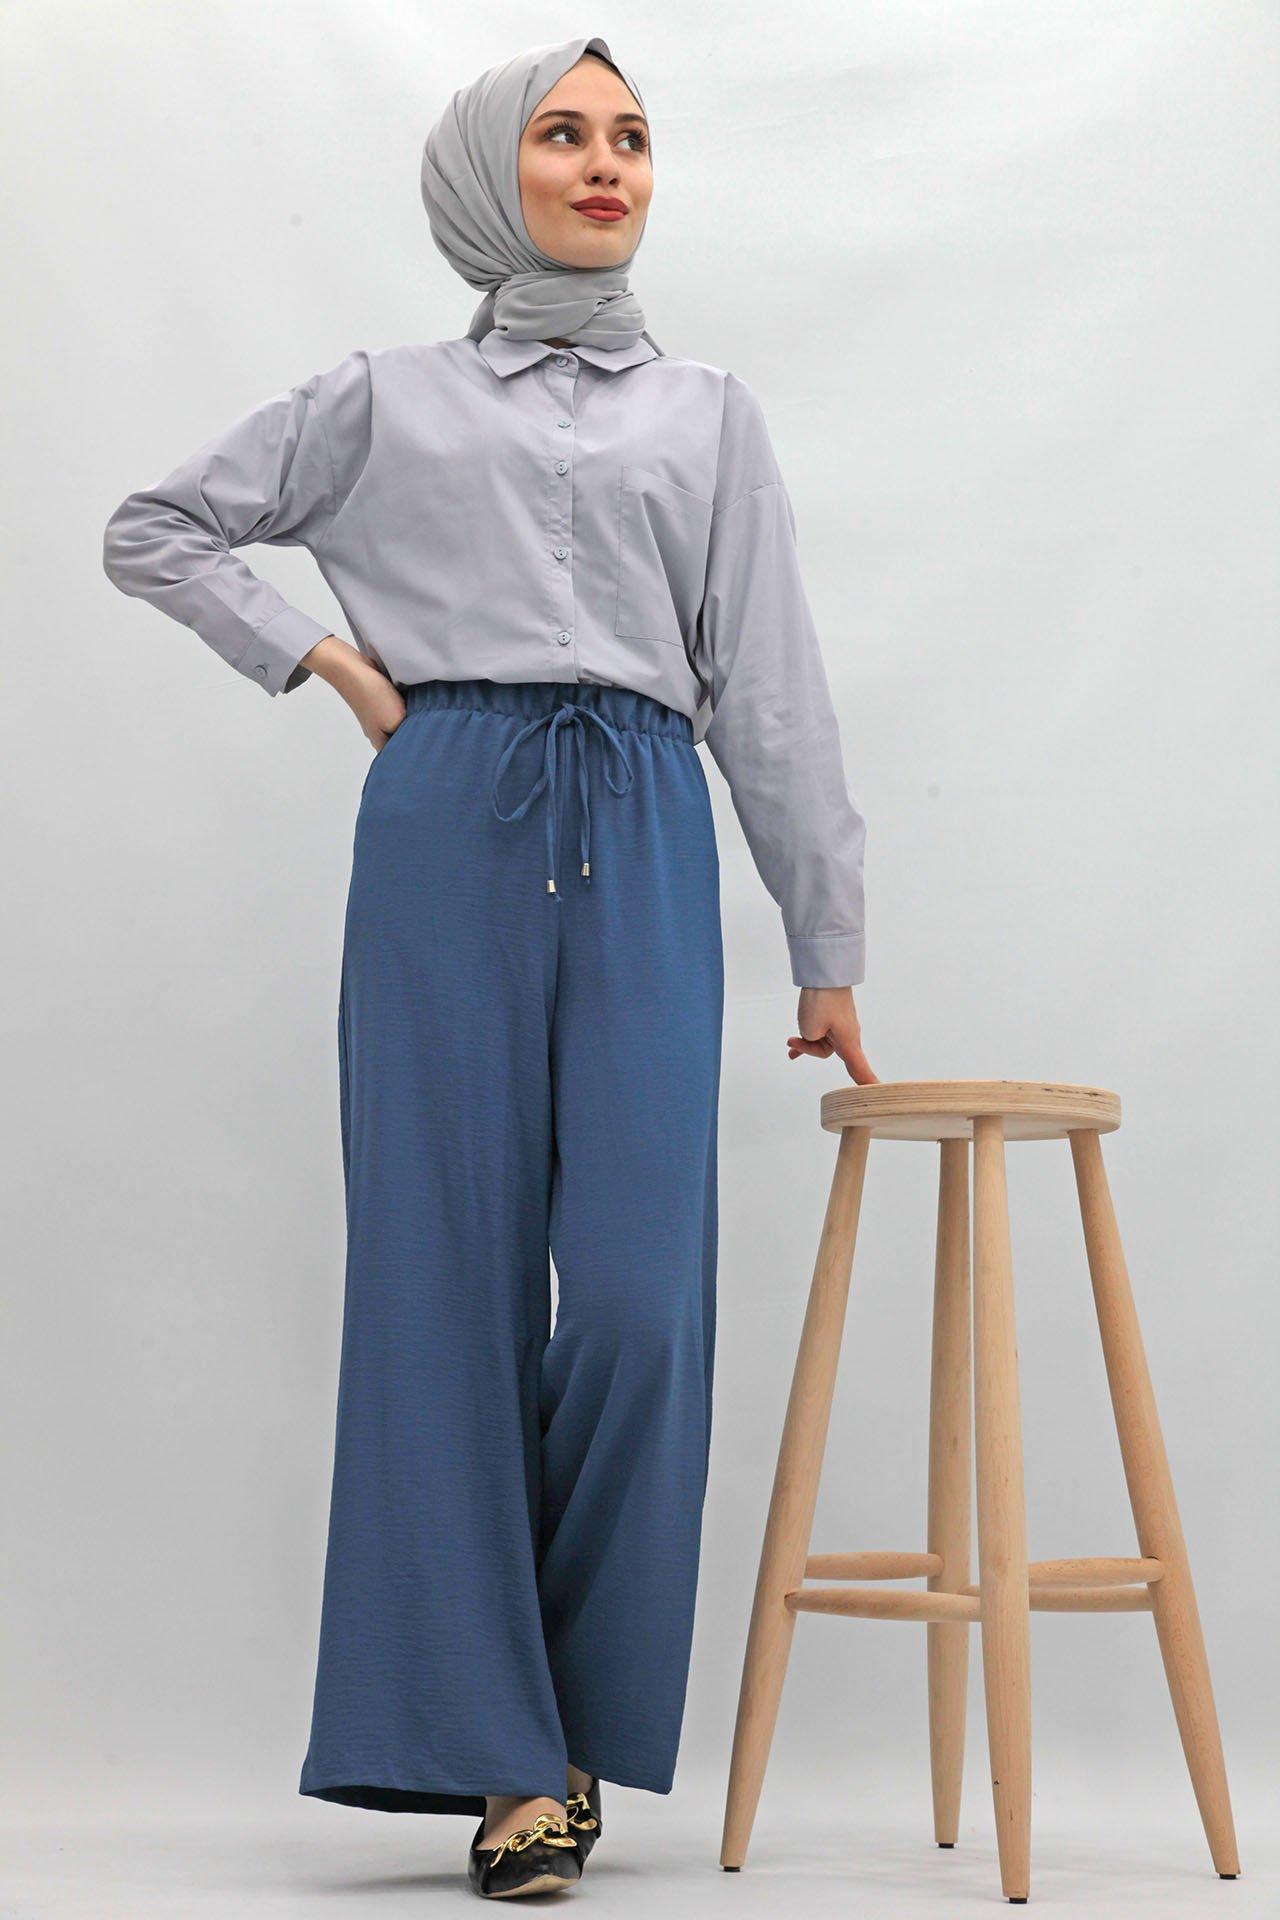 GİZAGİYİM - Bol Paça Aerobin Pantolon İndigo